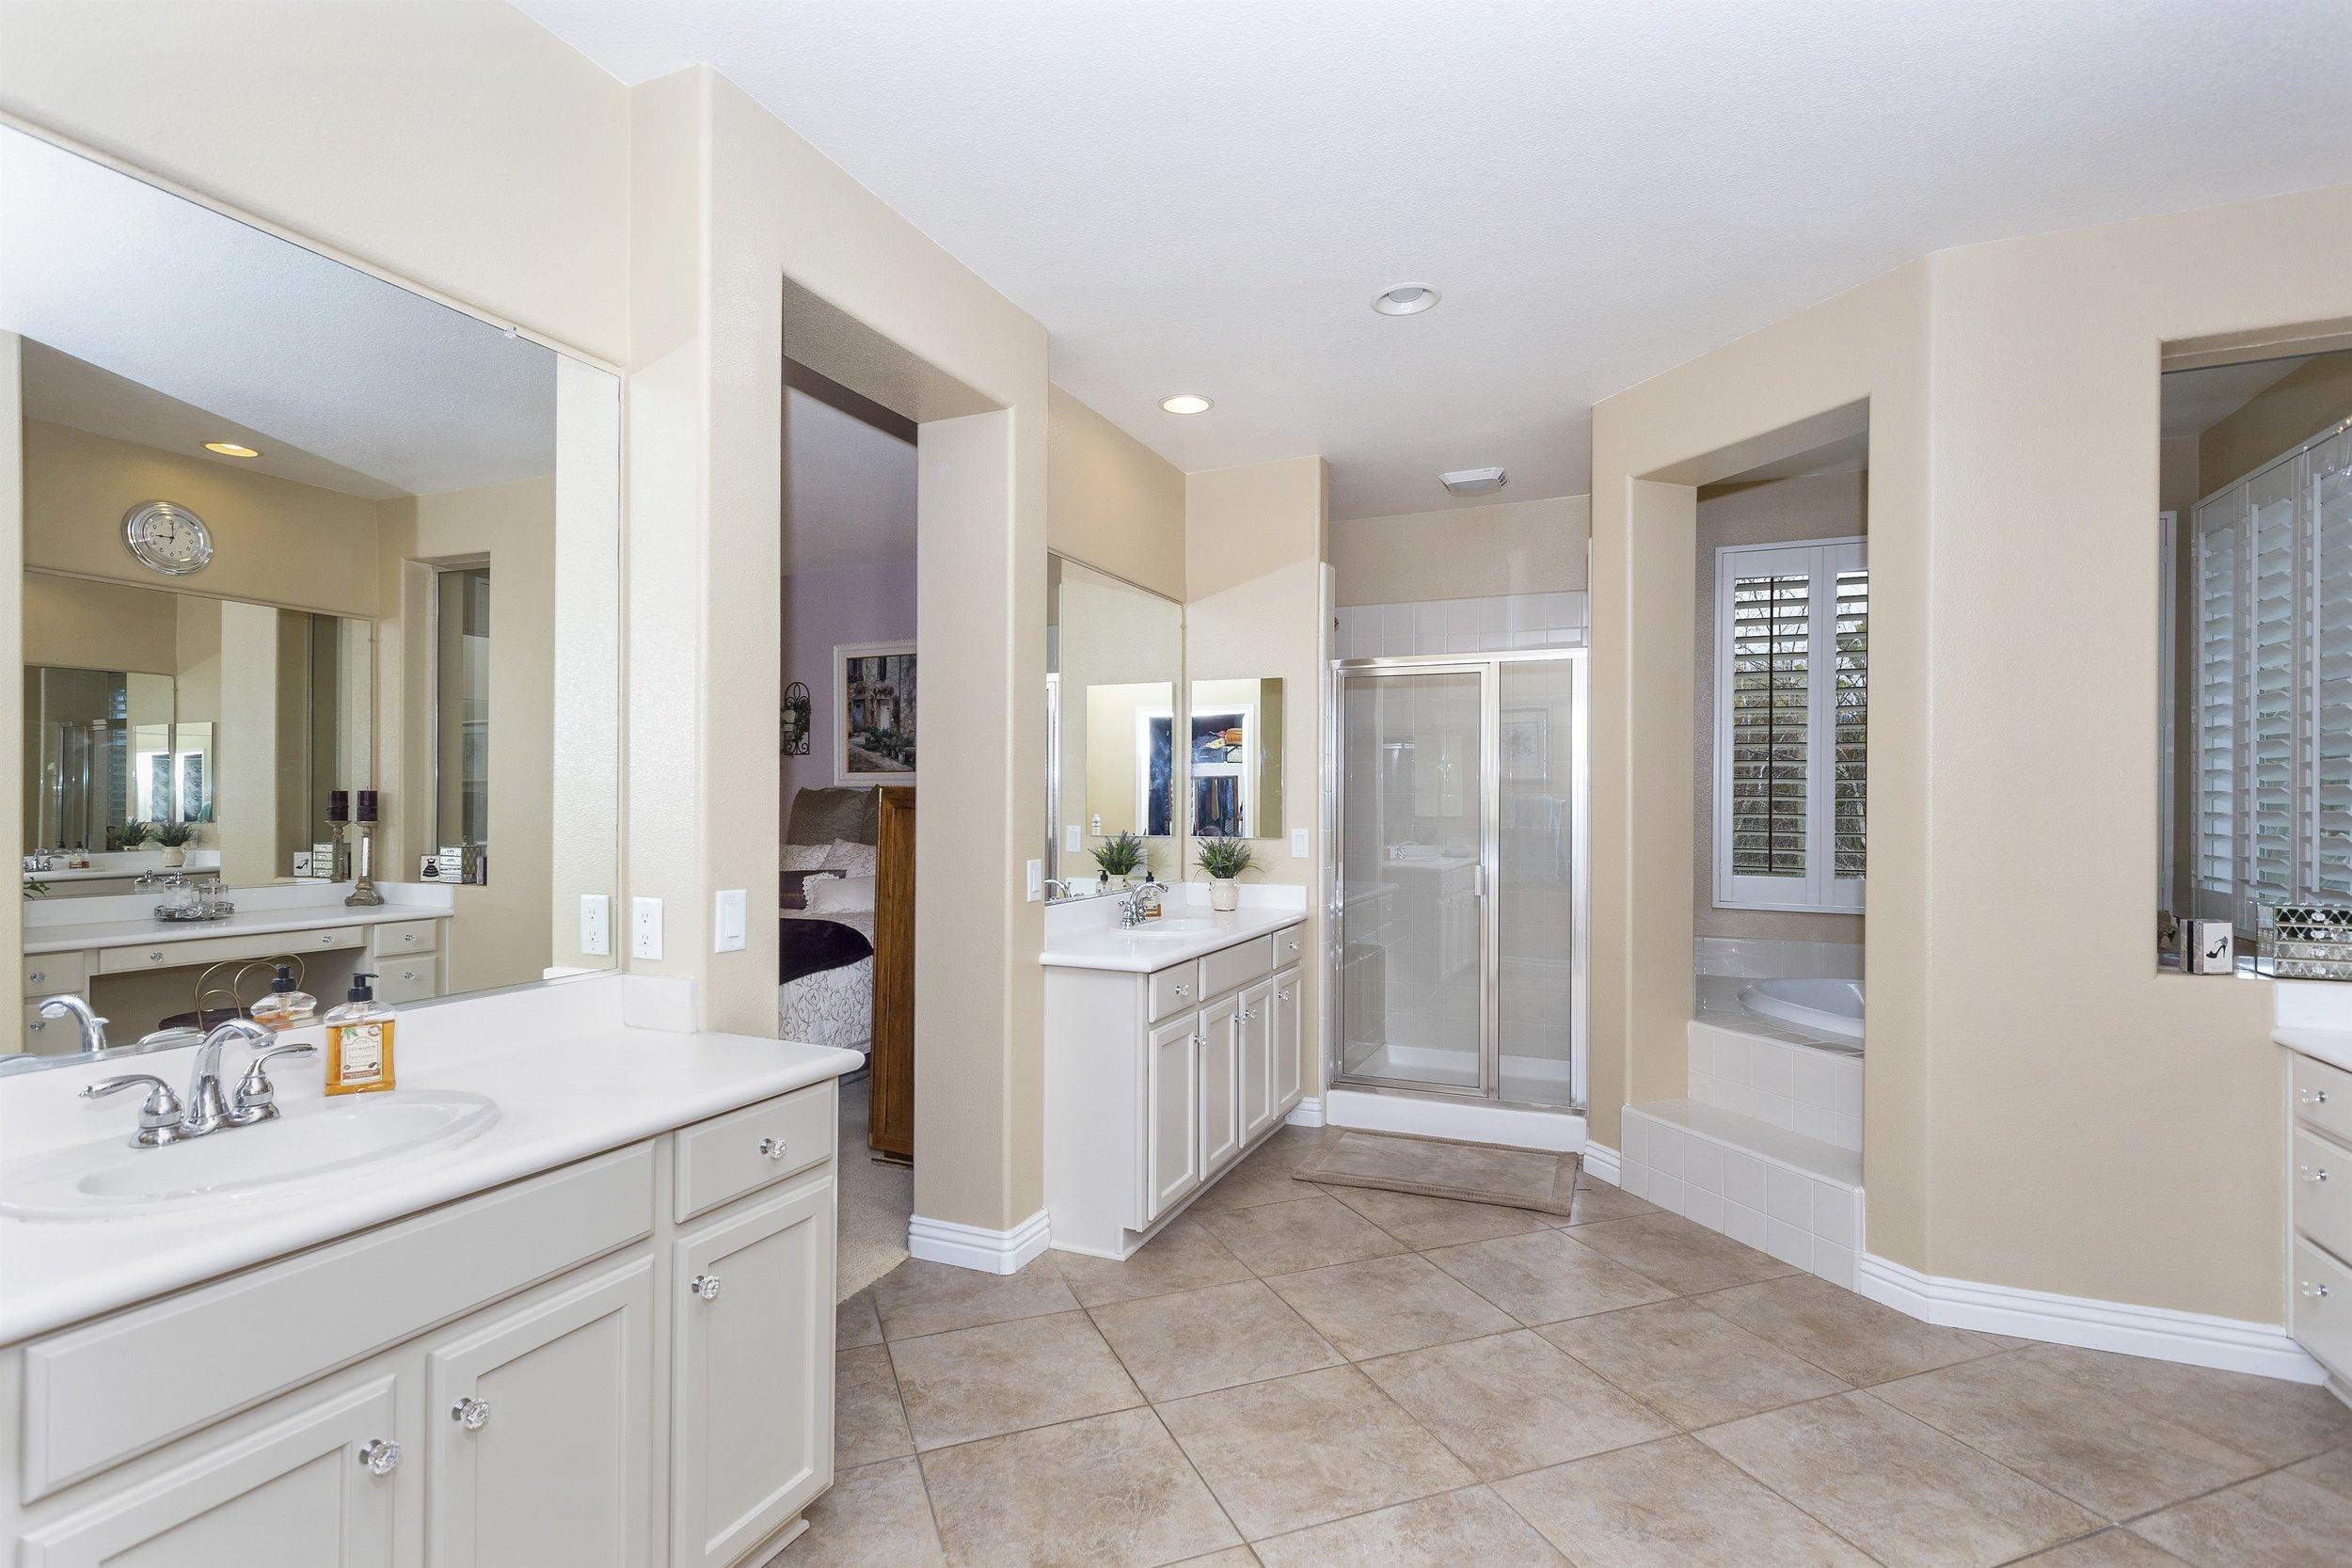 039_2nd Floor Master Bathroom.jpg